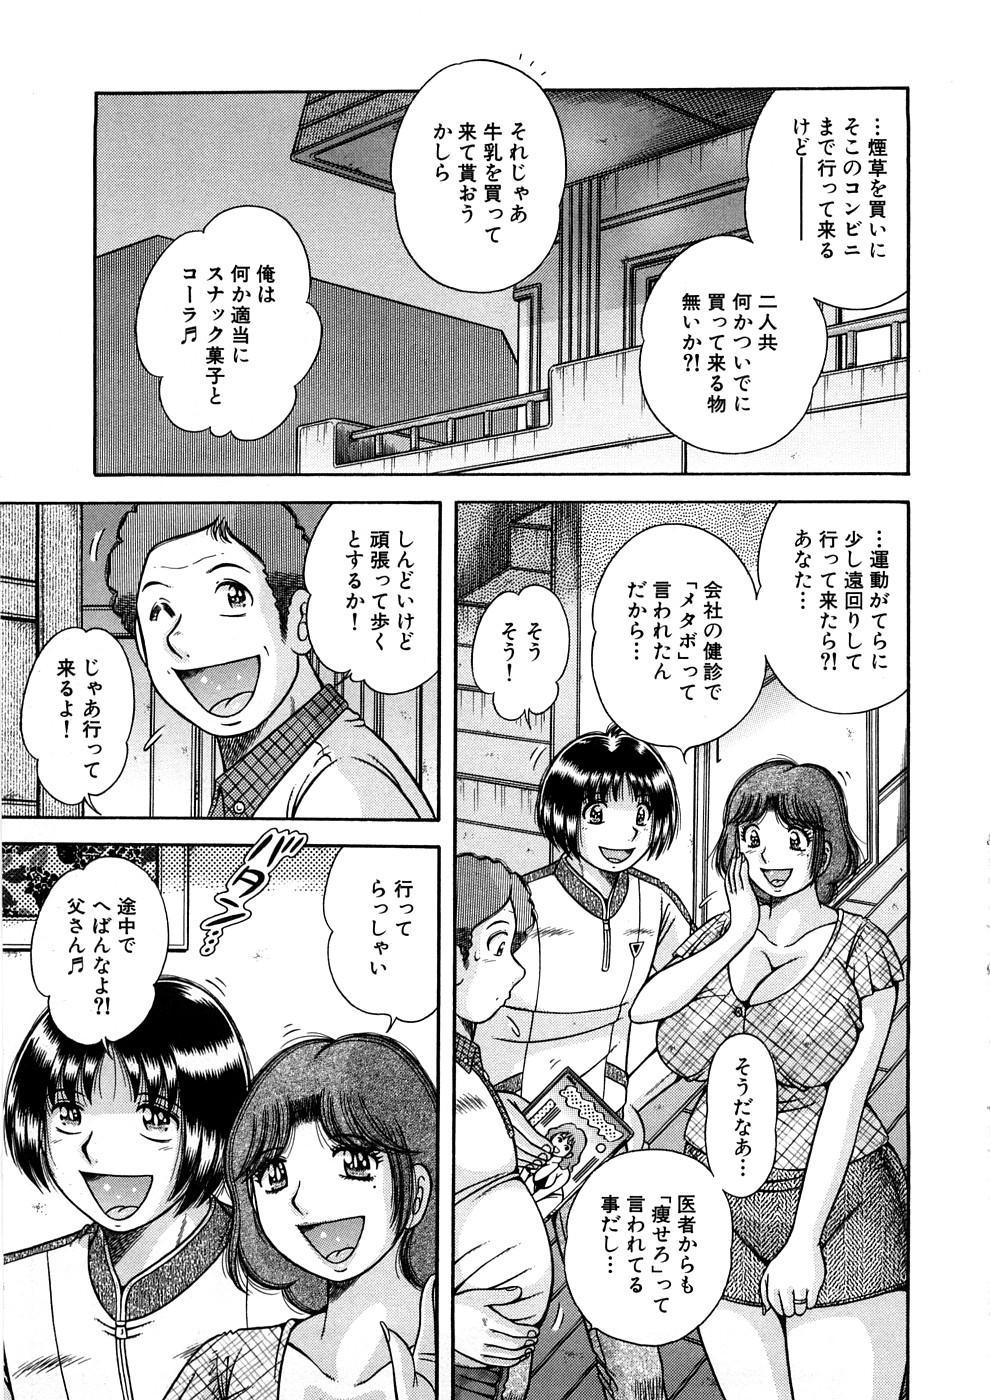 Geki Yaba Anthology Vol. 1 - Naka ni Dashite yo 203